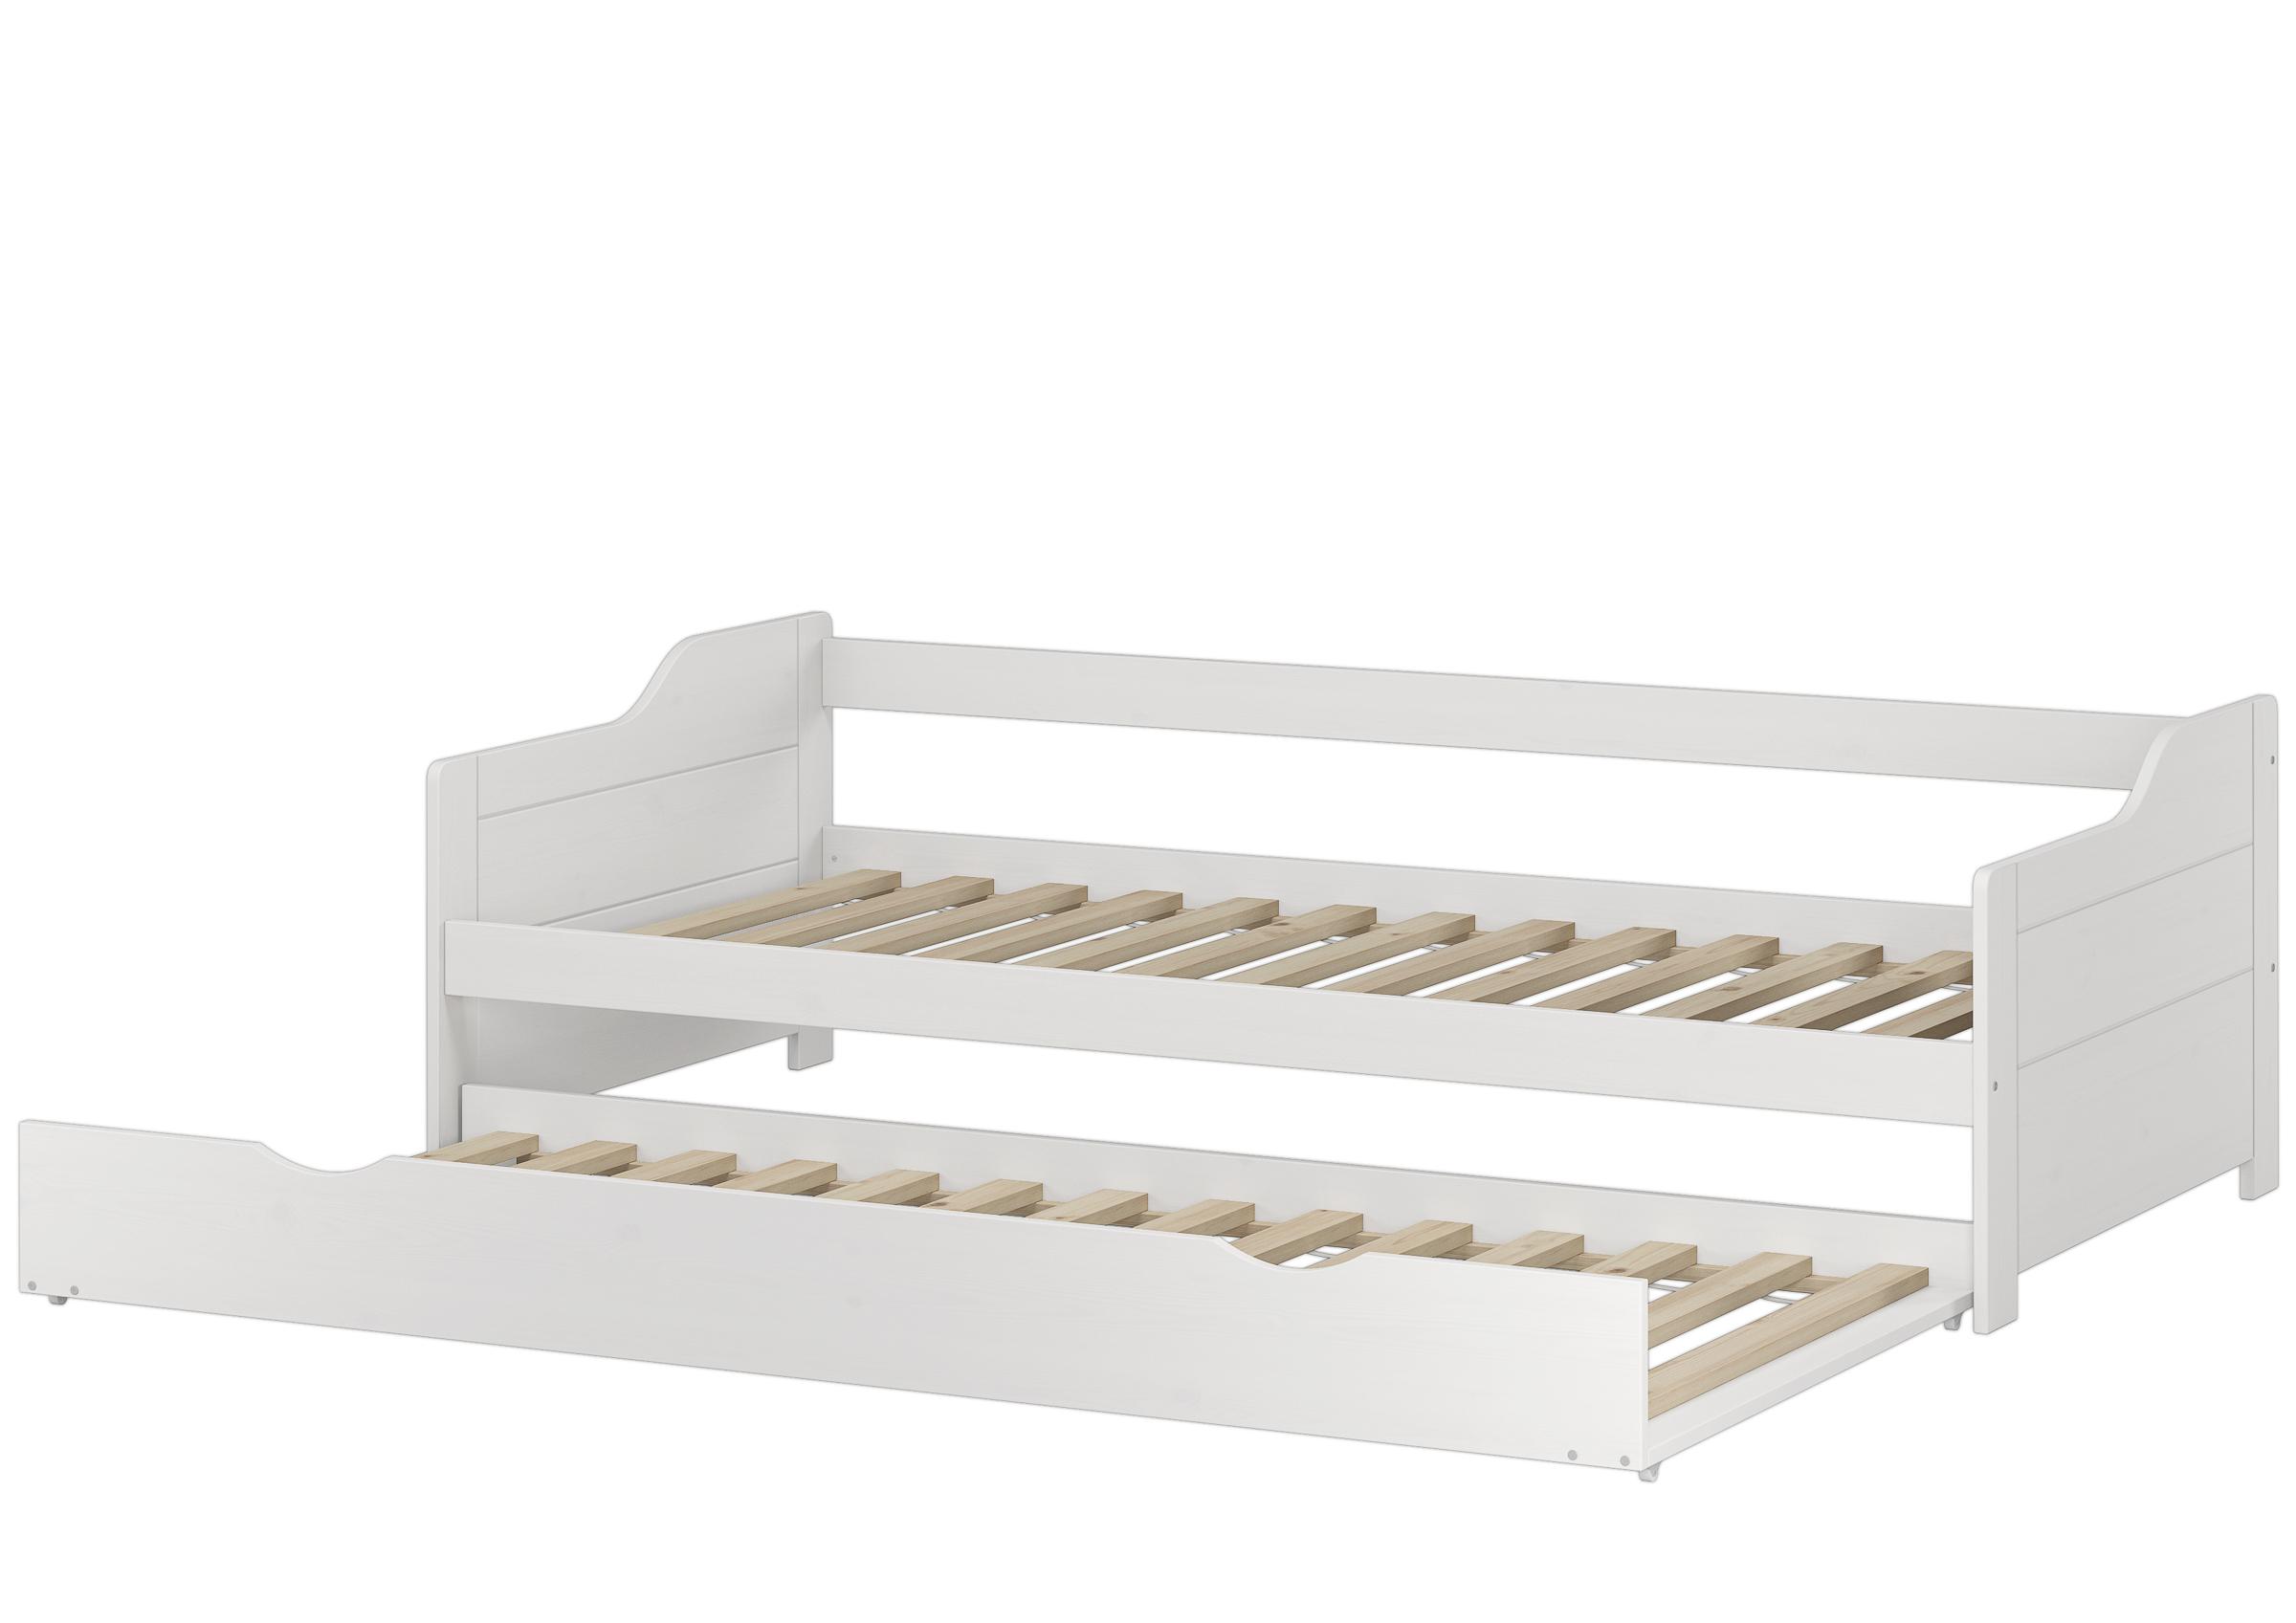 Full Size of Bett 90x200 Weiß Sofabett Doppelbett Bettgestell Einzelbett 180x200 Ausklappbar Sofa Grau Mit Unterbett Betten Outlet Schubladen Hochglanz Regal Runder Bett Bett 90x200 Weiß